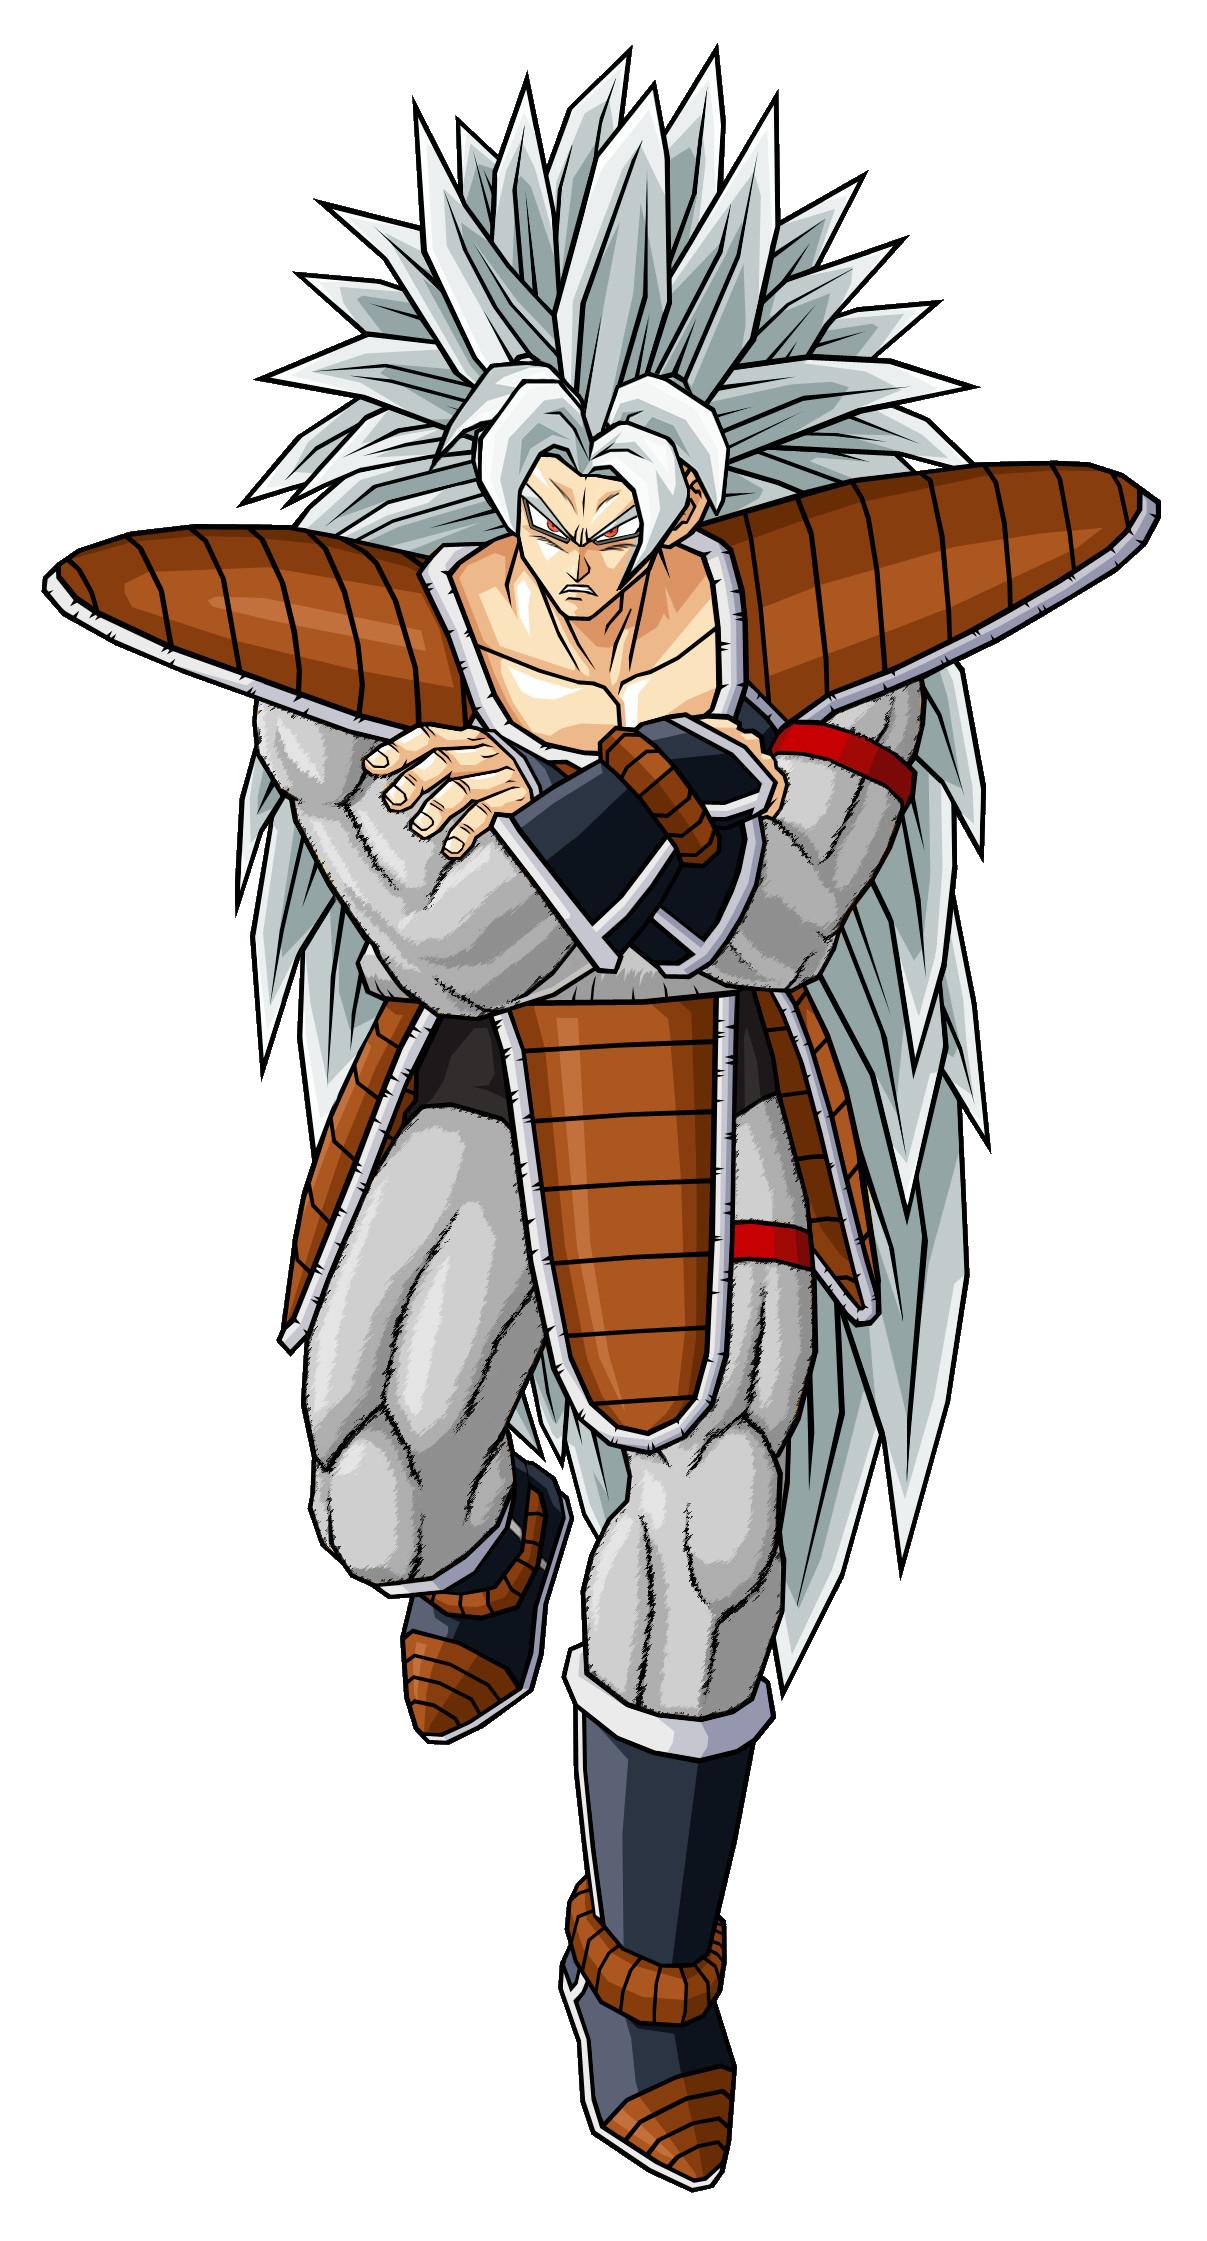 Image raditz silver saiyan ssj5 by robertovile ultra dragon ball wiki fandom - Super sayen 10000 ...